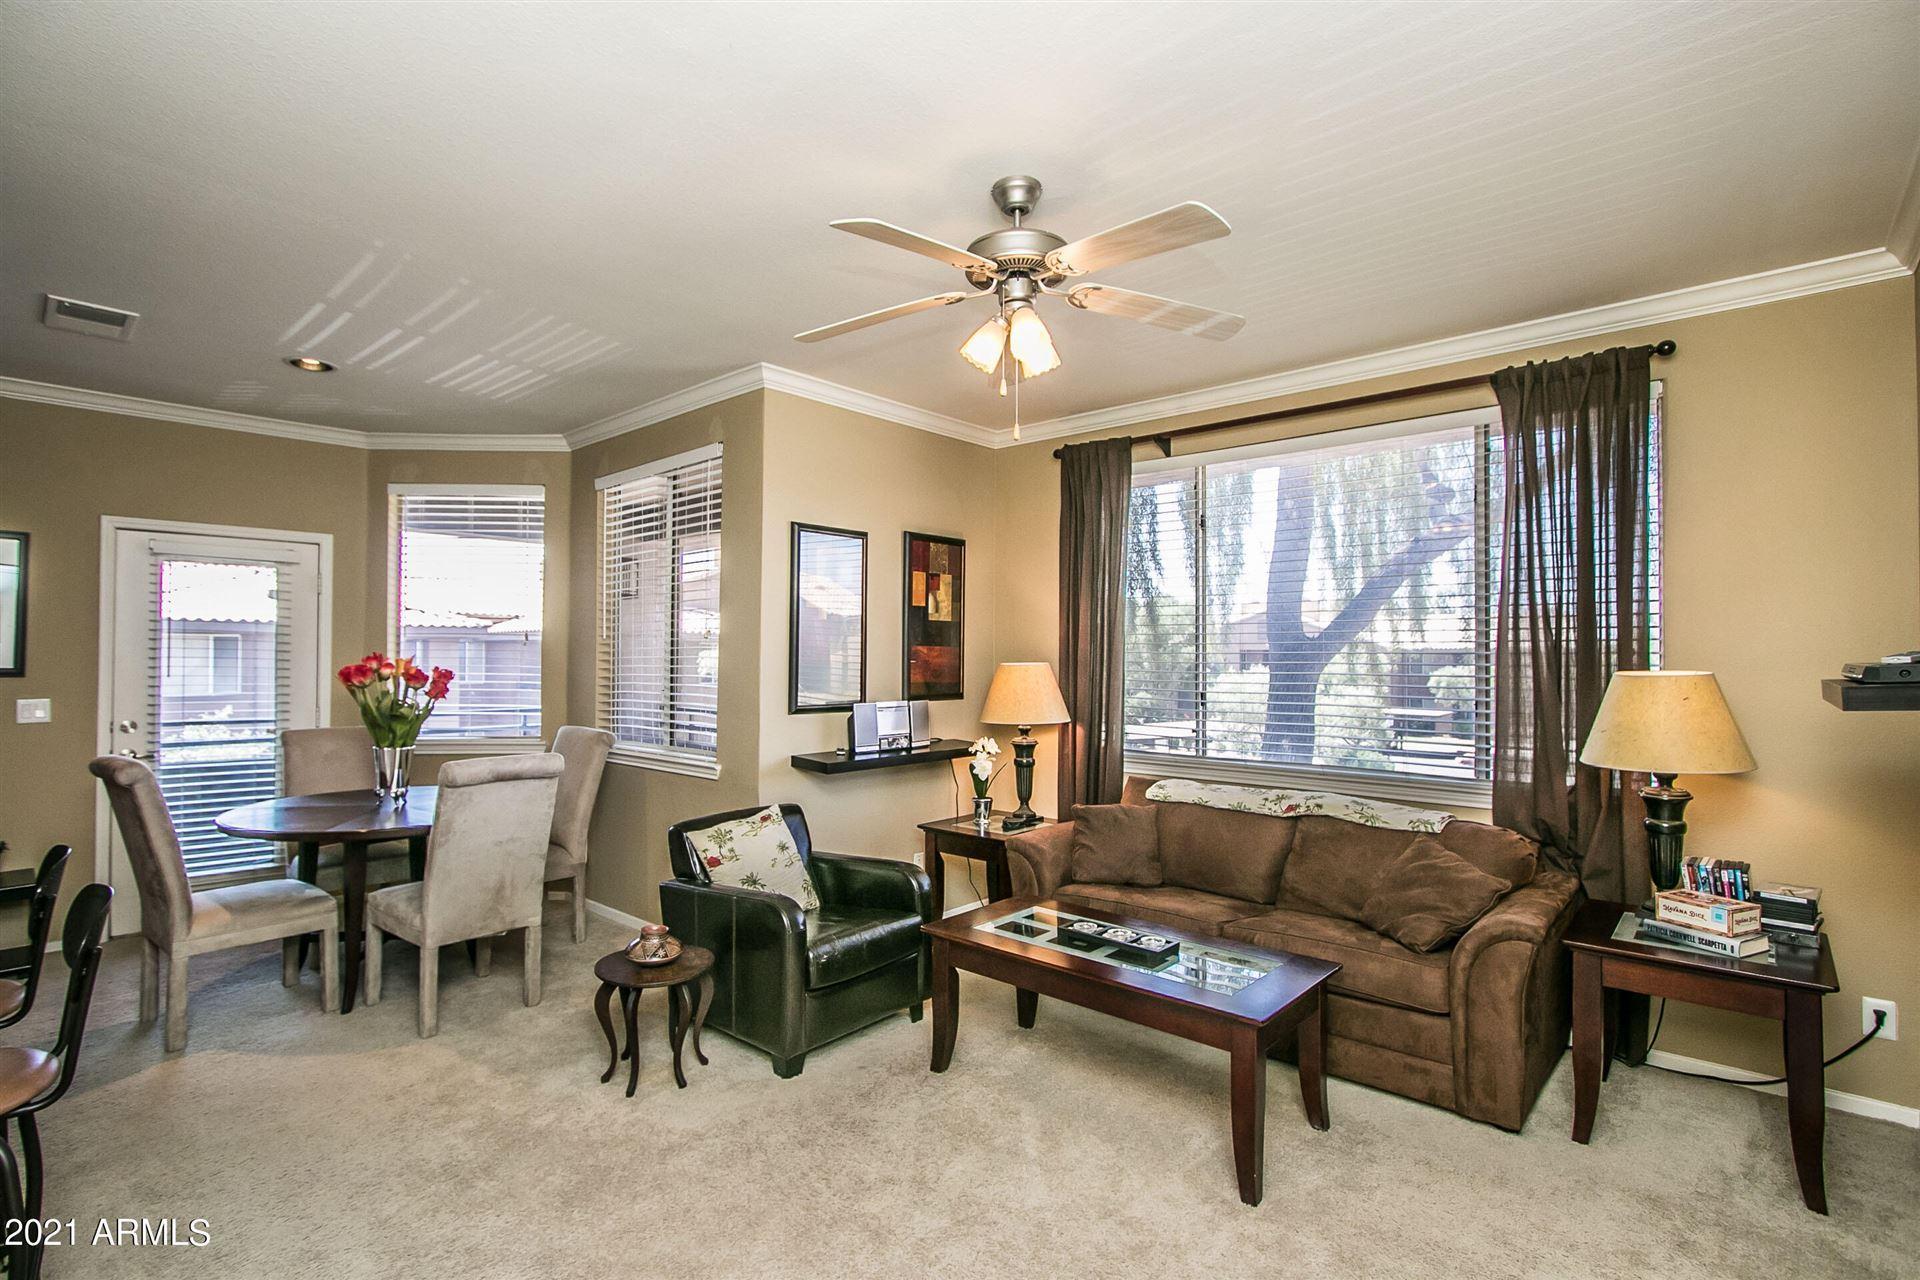 Photo of 7009 E ACOMA Drive #2138, Scottsdale, AZ 85254 (MLS # 6234561)